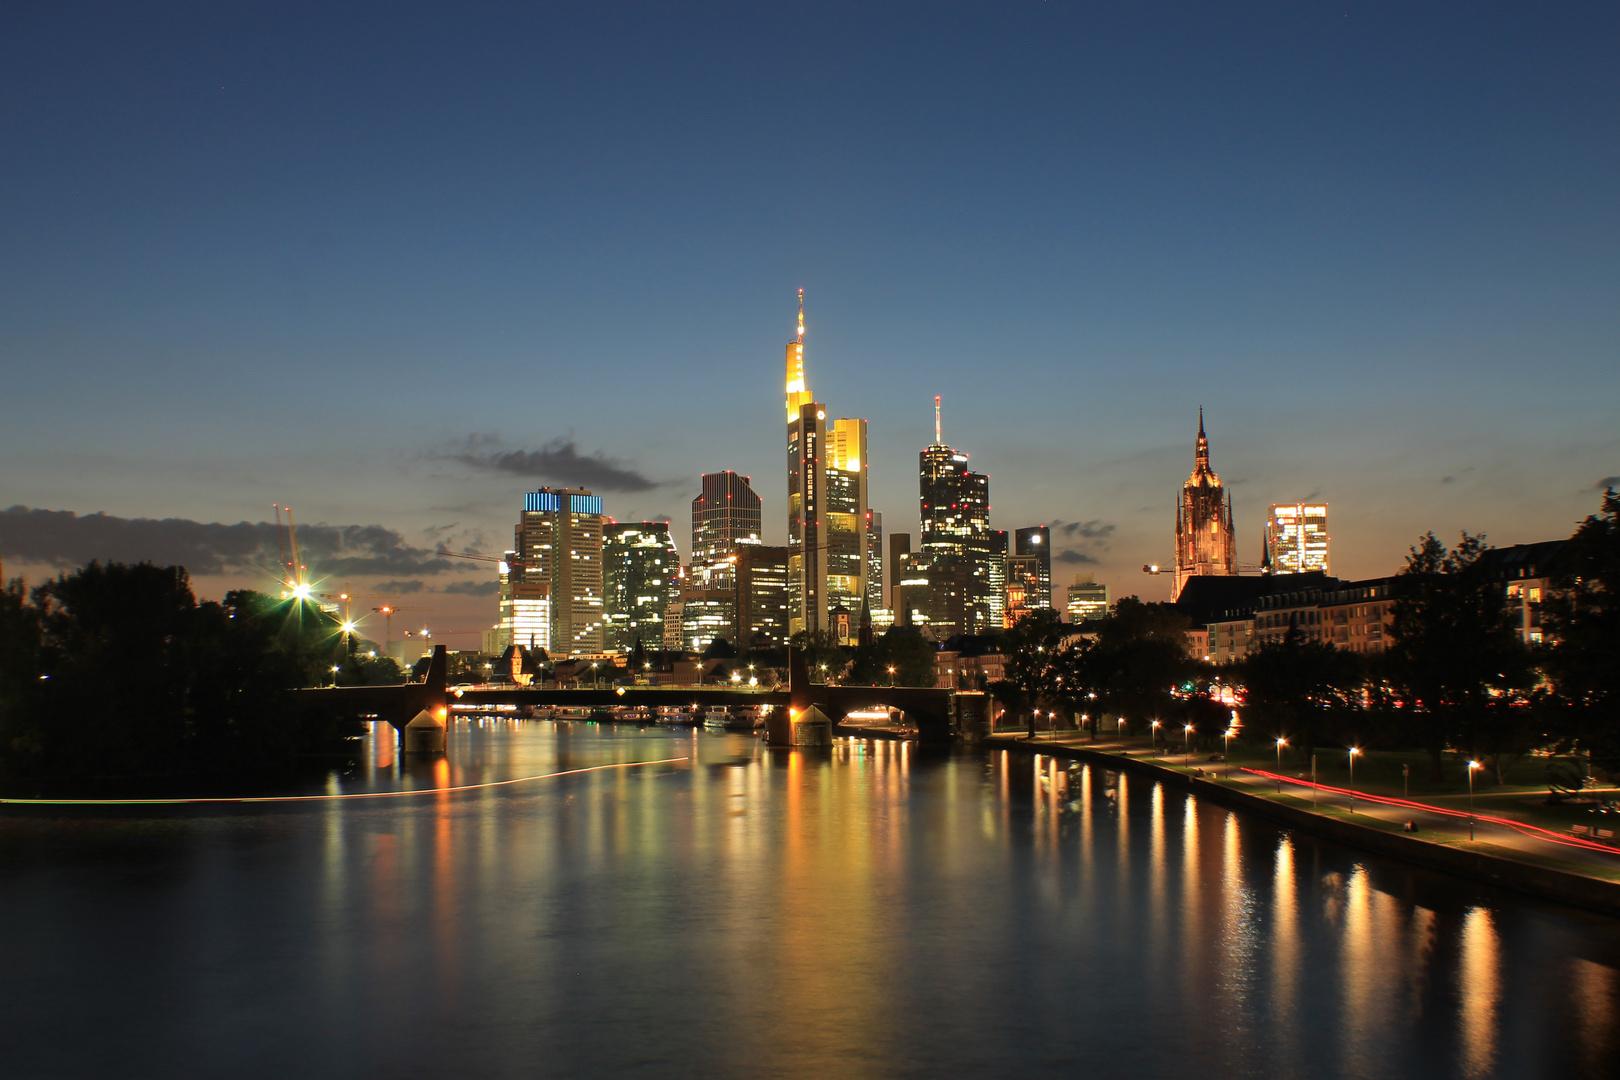 Frankfurt's Blaue Stunde